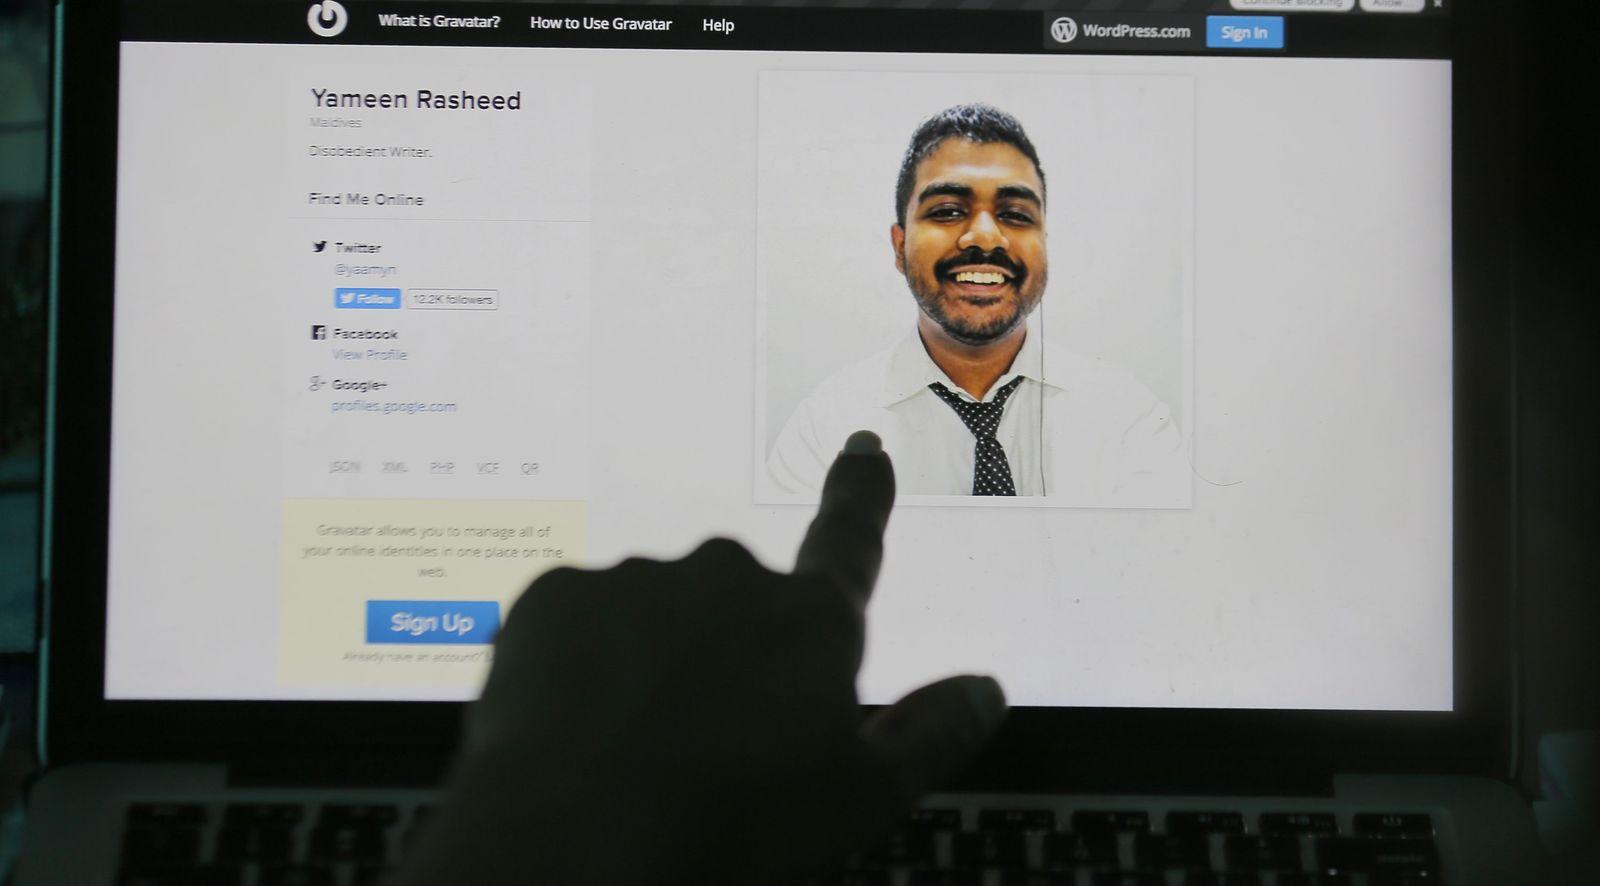 Maldives Blogger Killed